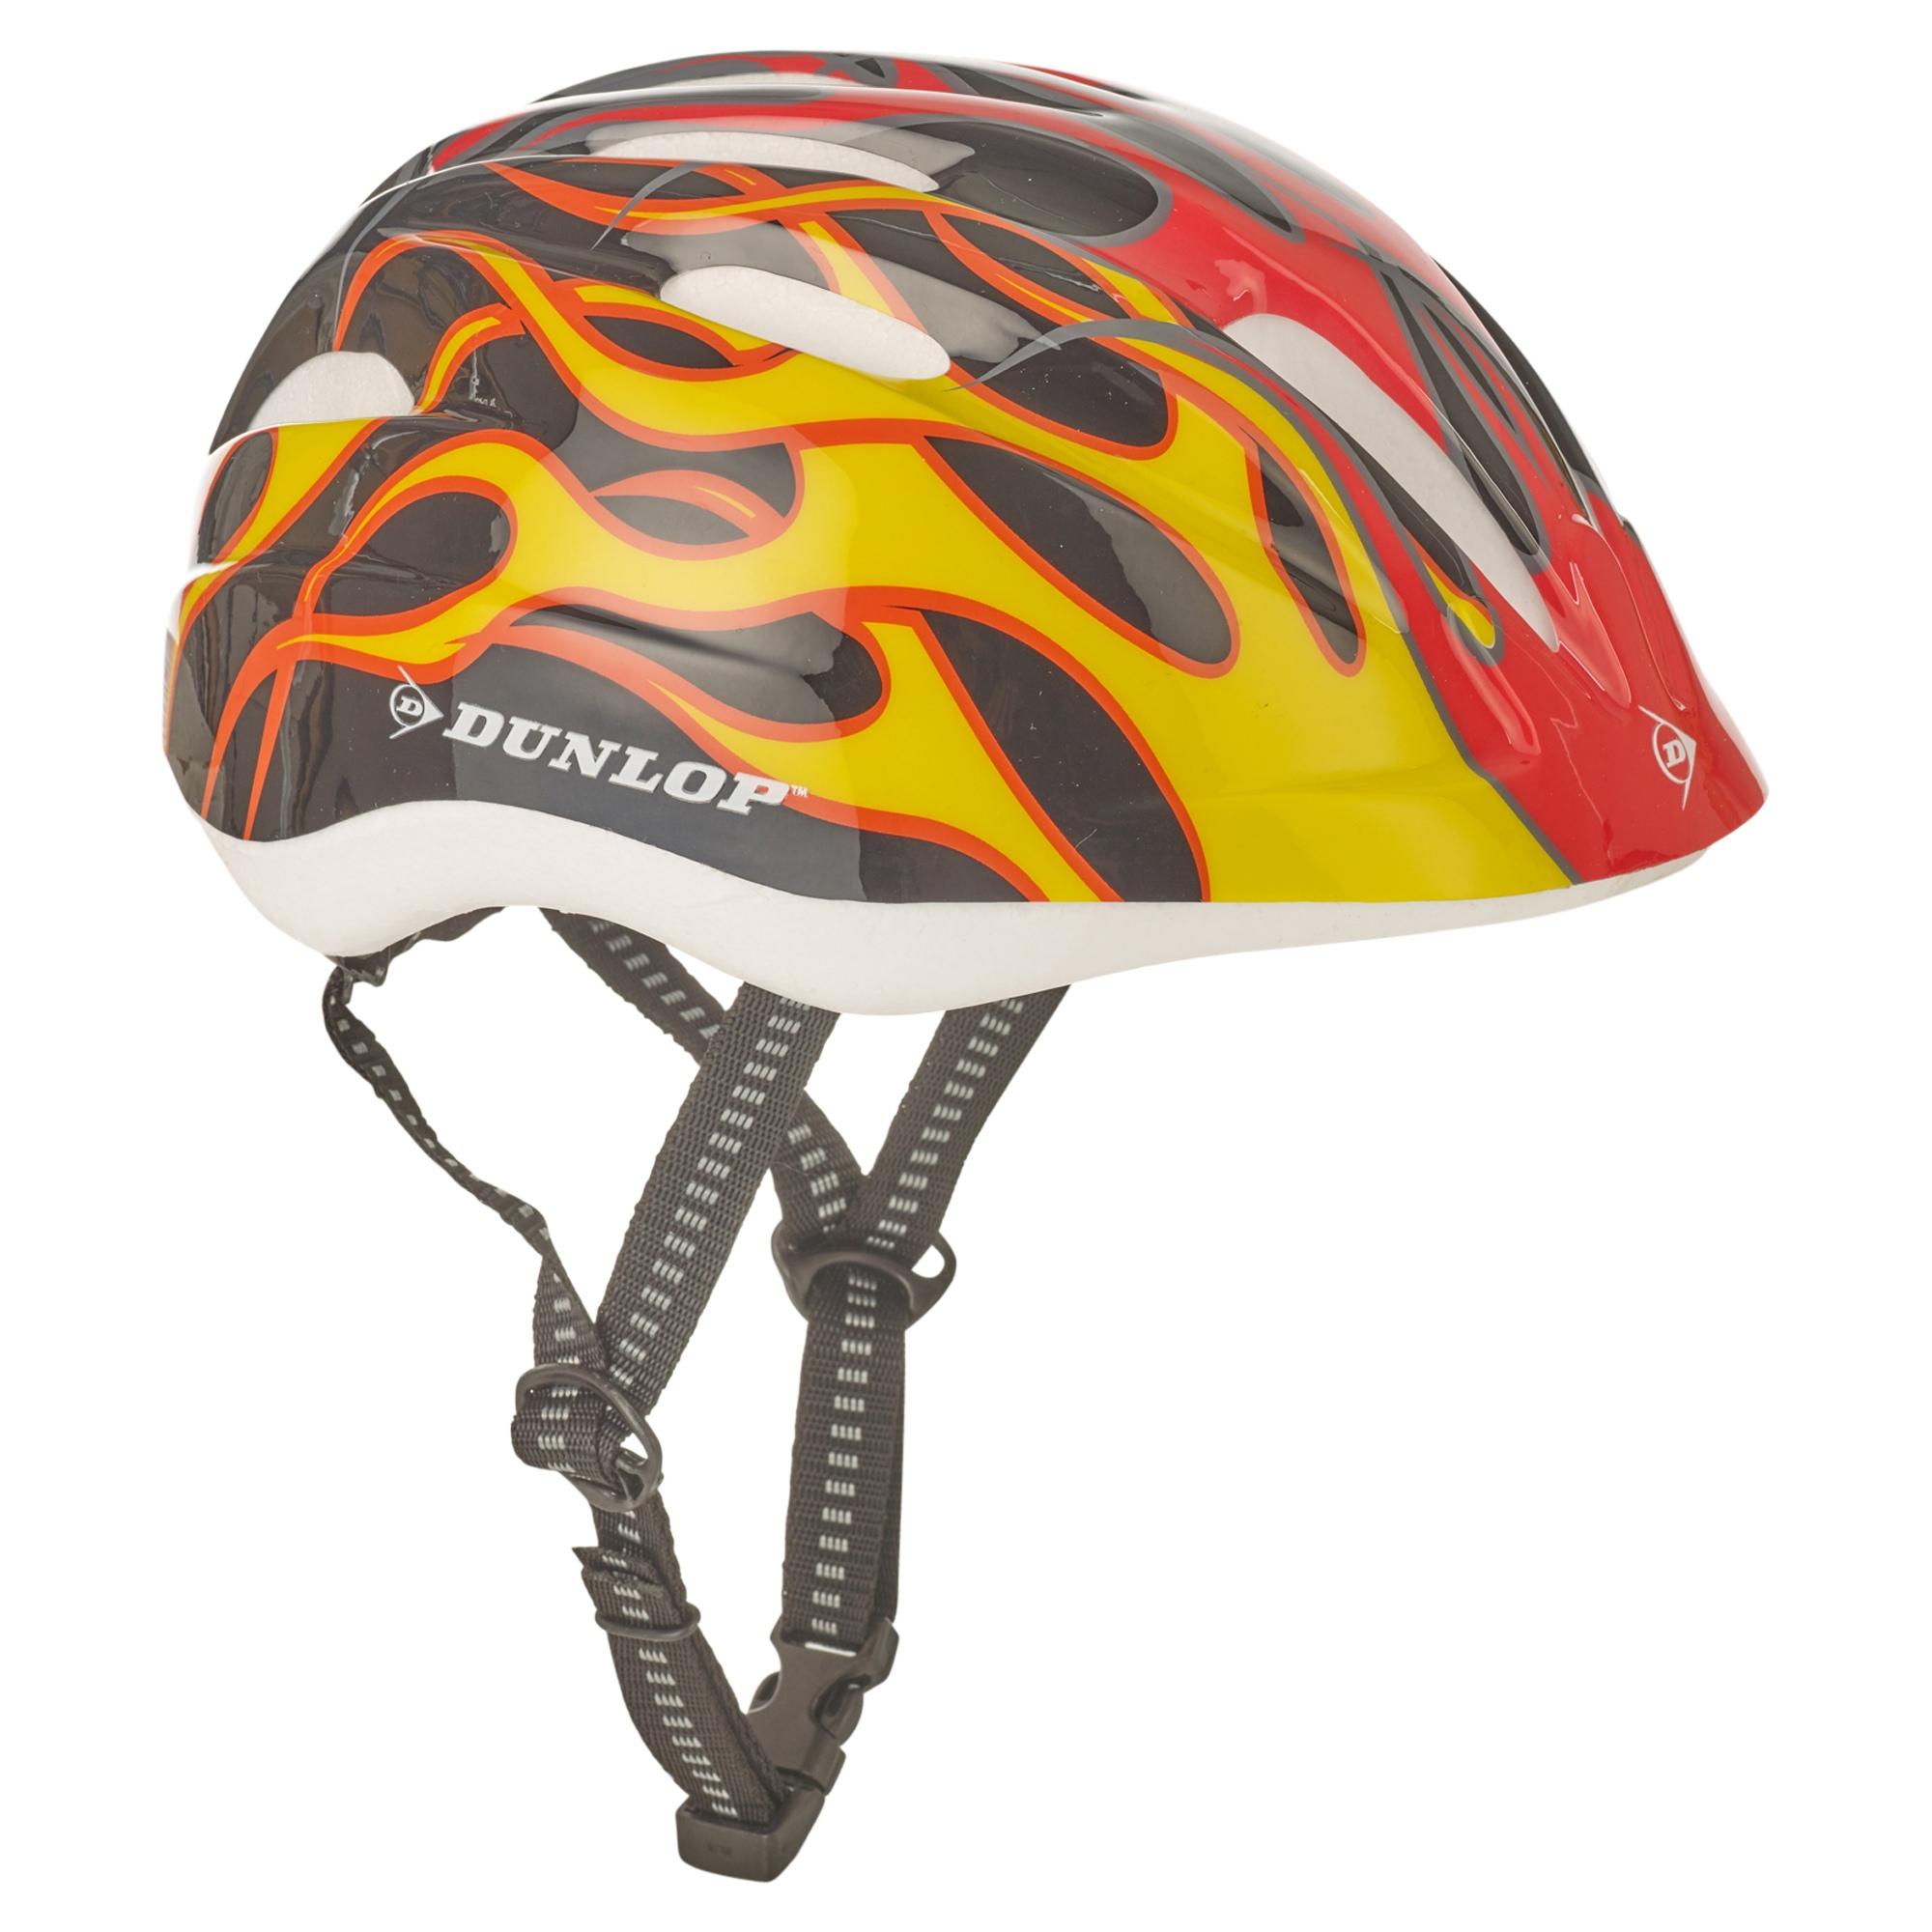 Dunlop Kids Bicycle Helmet Protective Gear Bike Adjustable